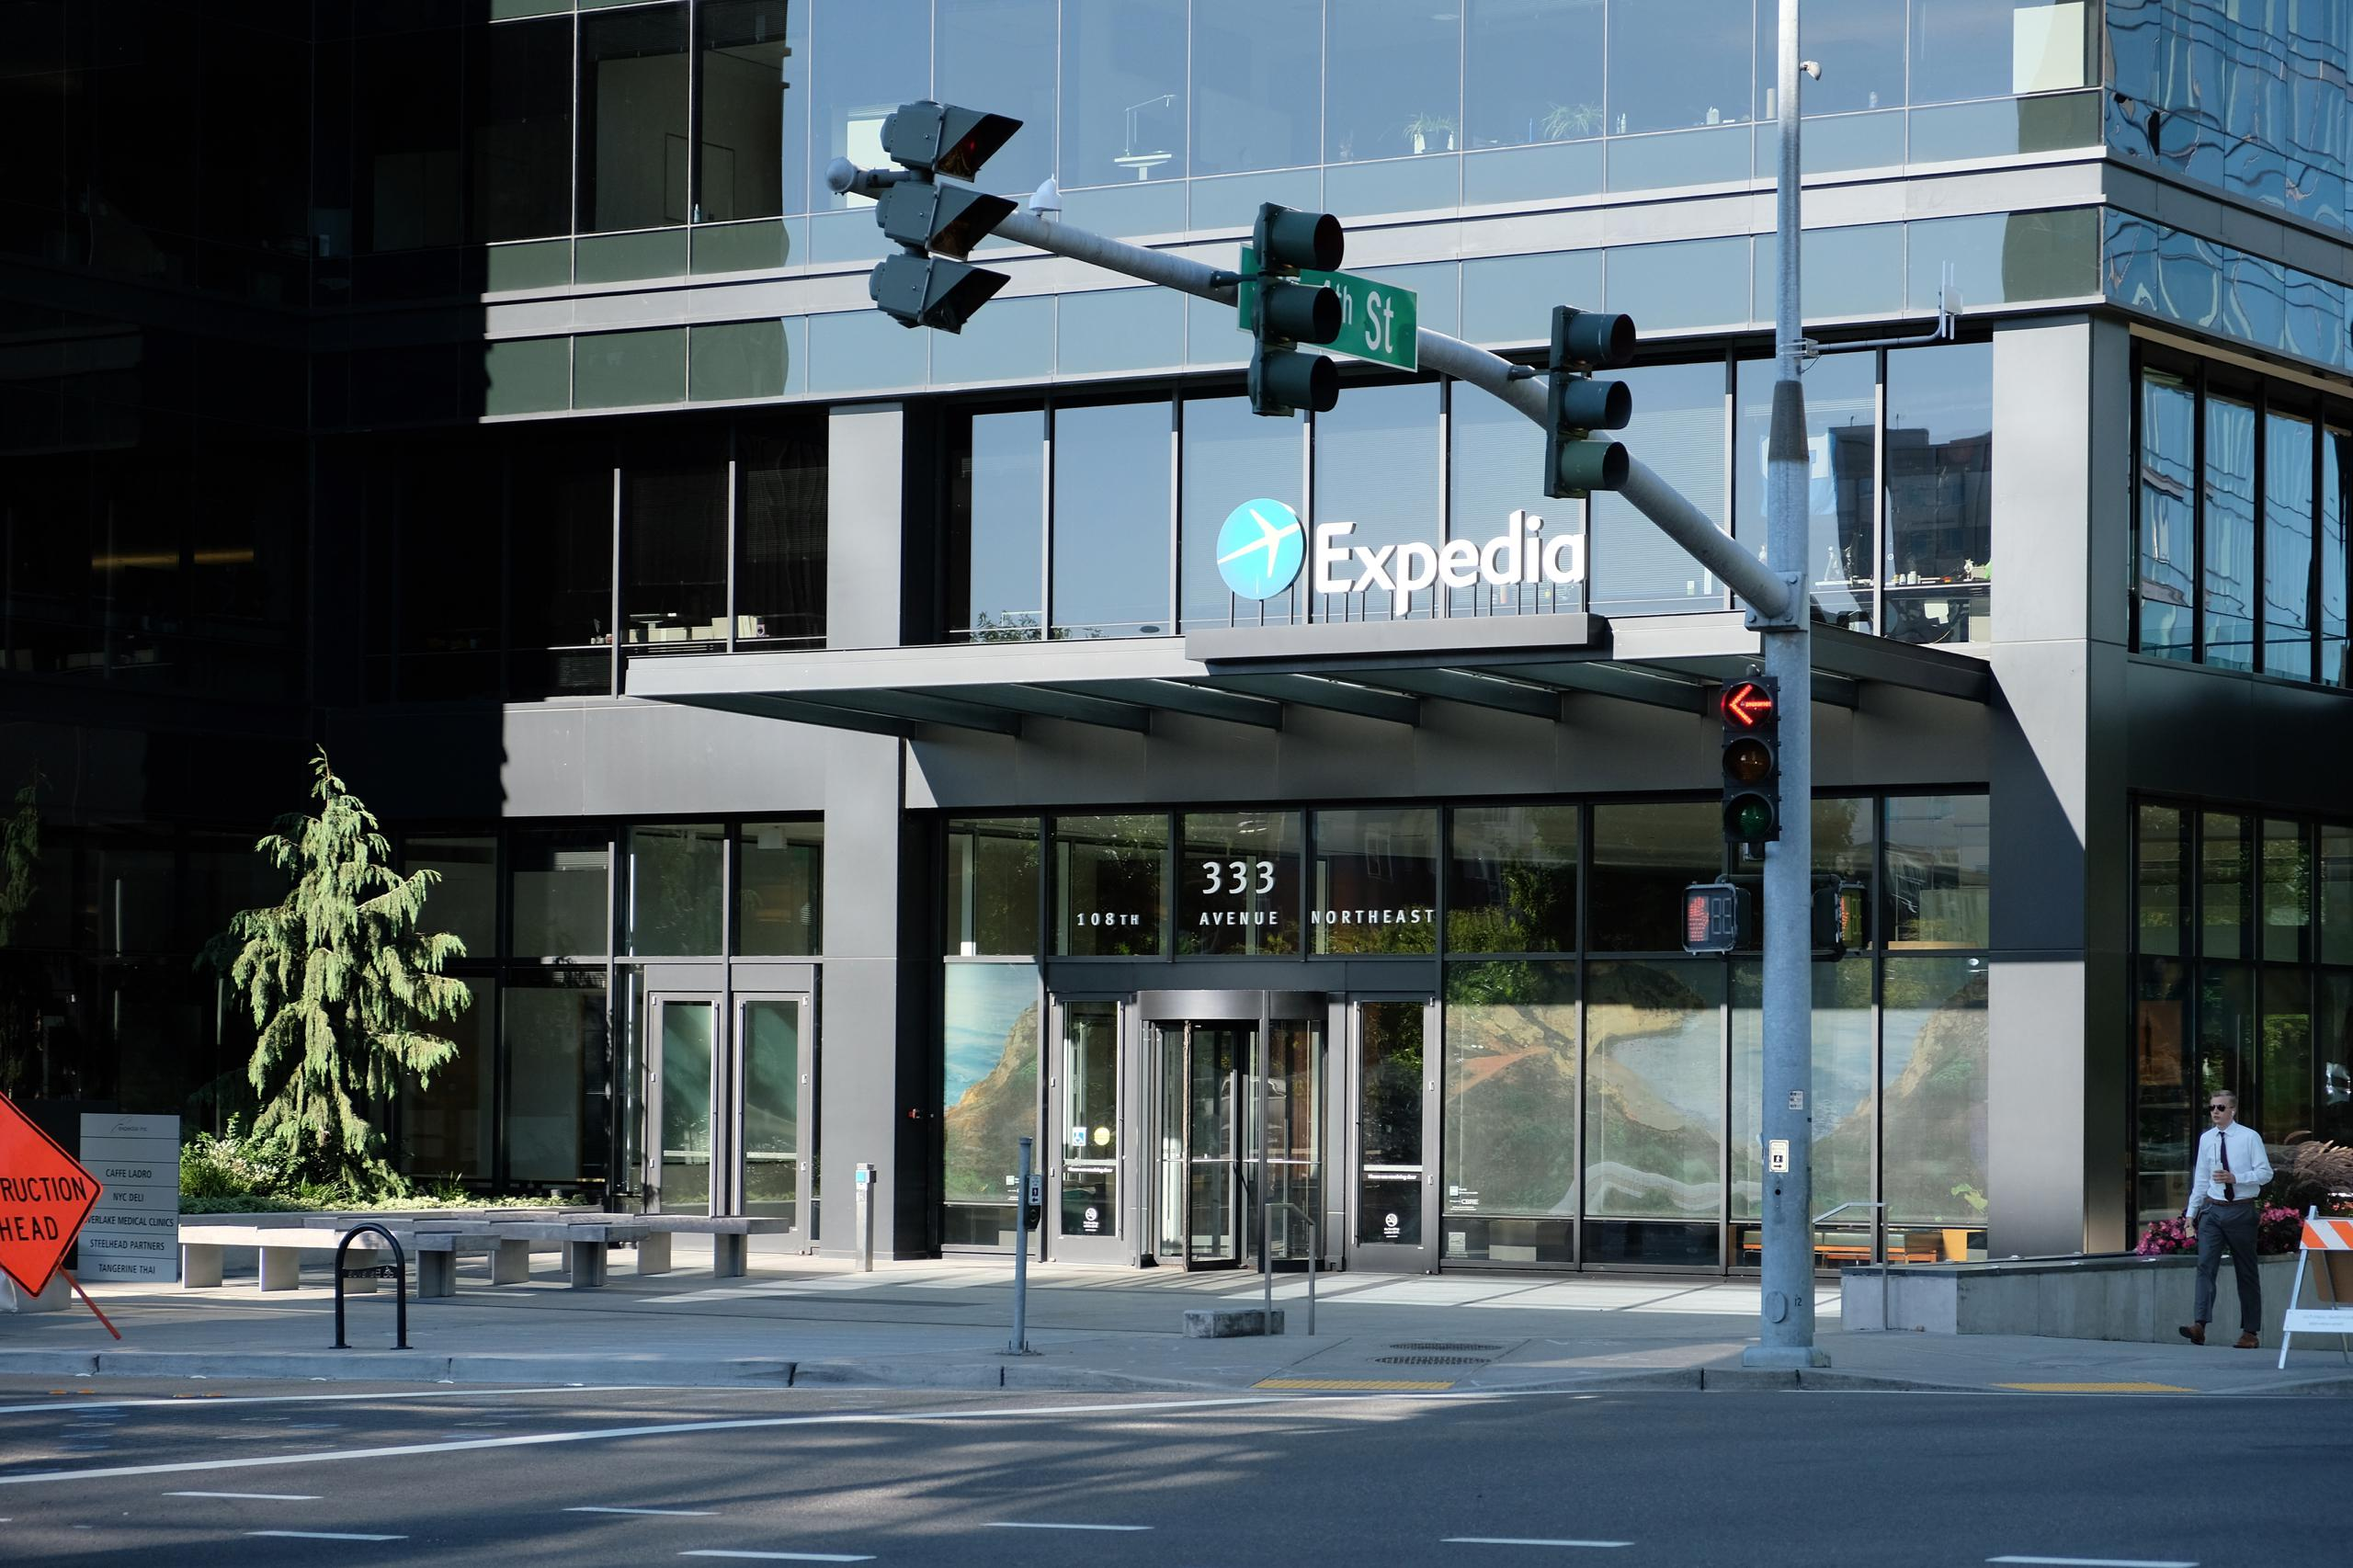 Expedia's corporate headquarters in Bellevue, Washington.